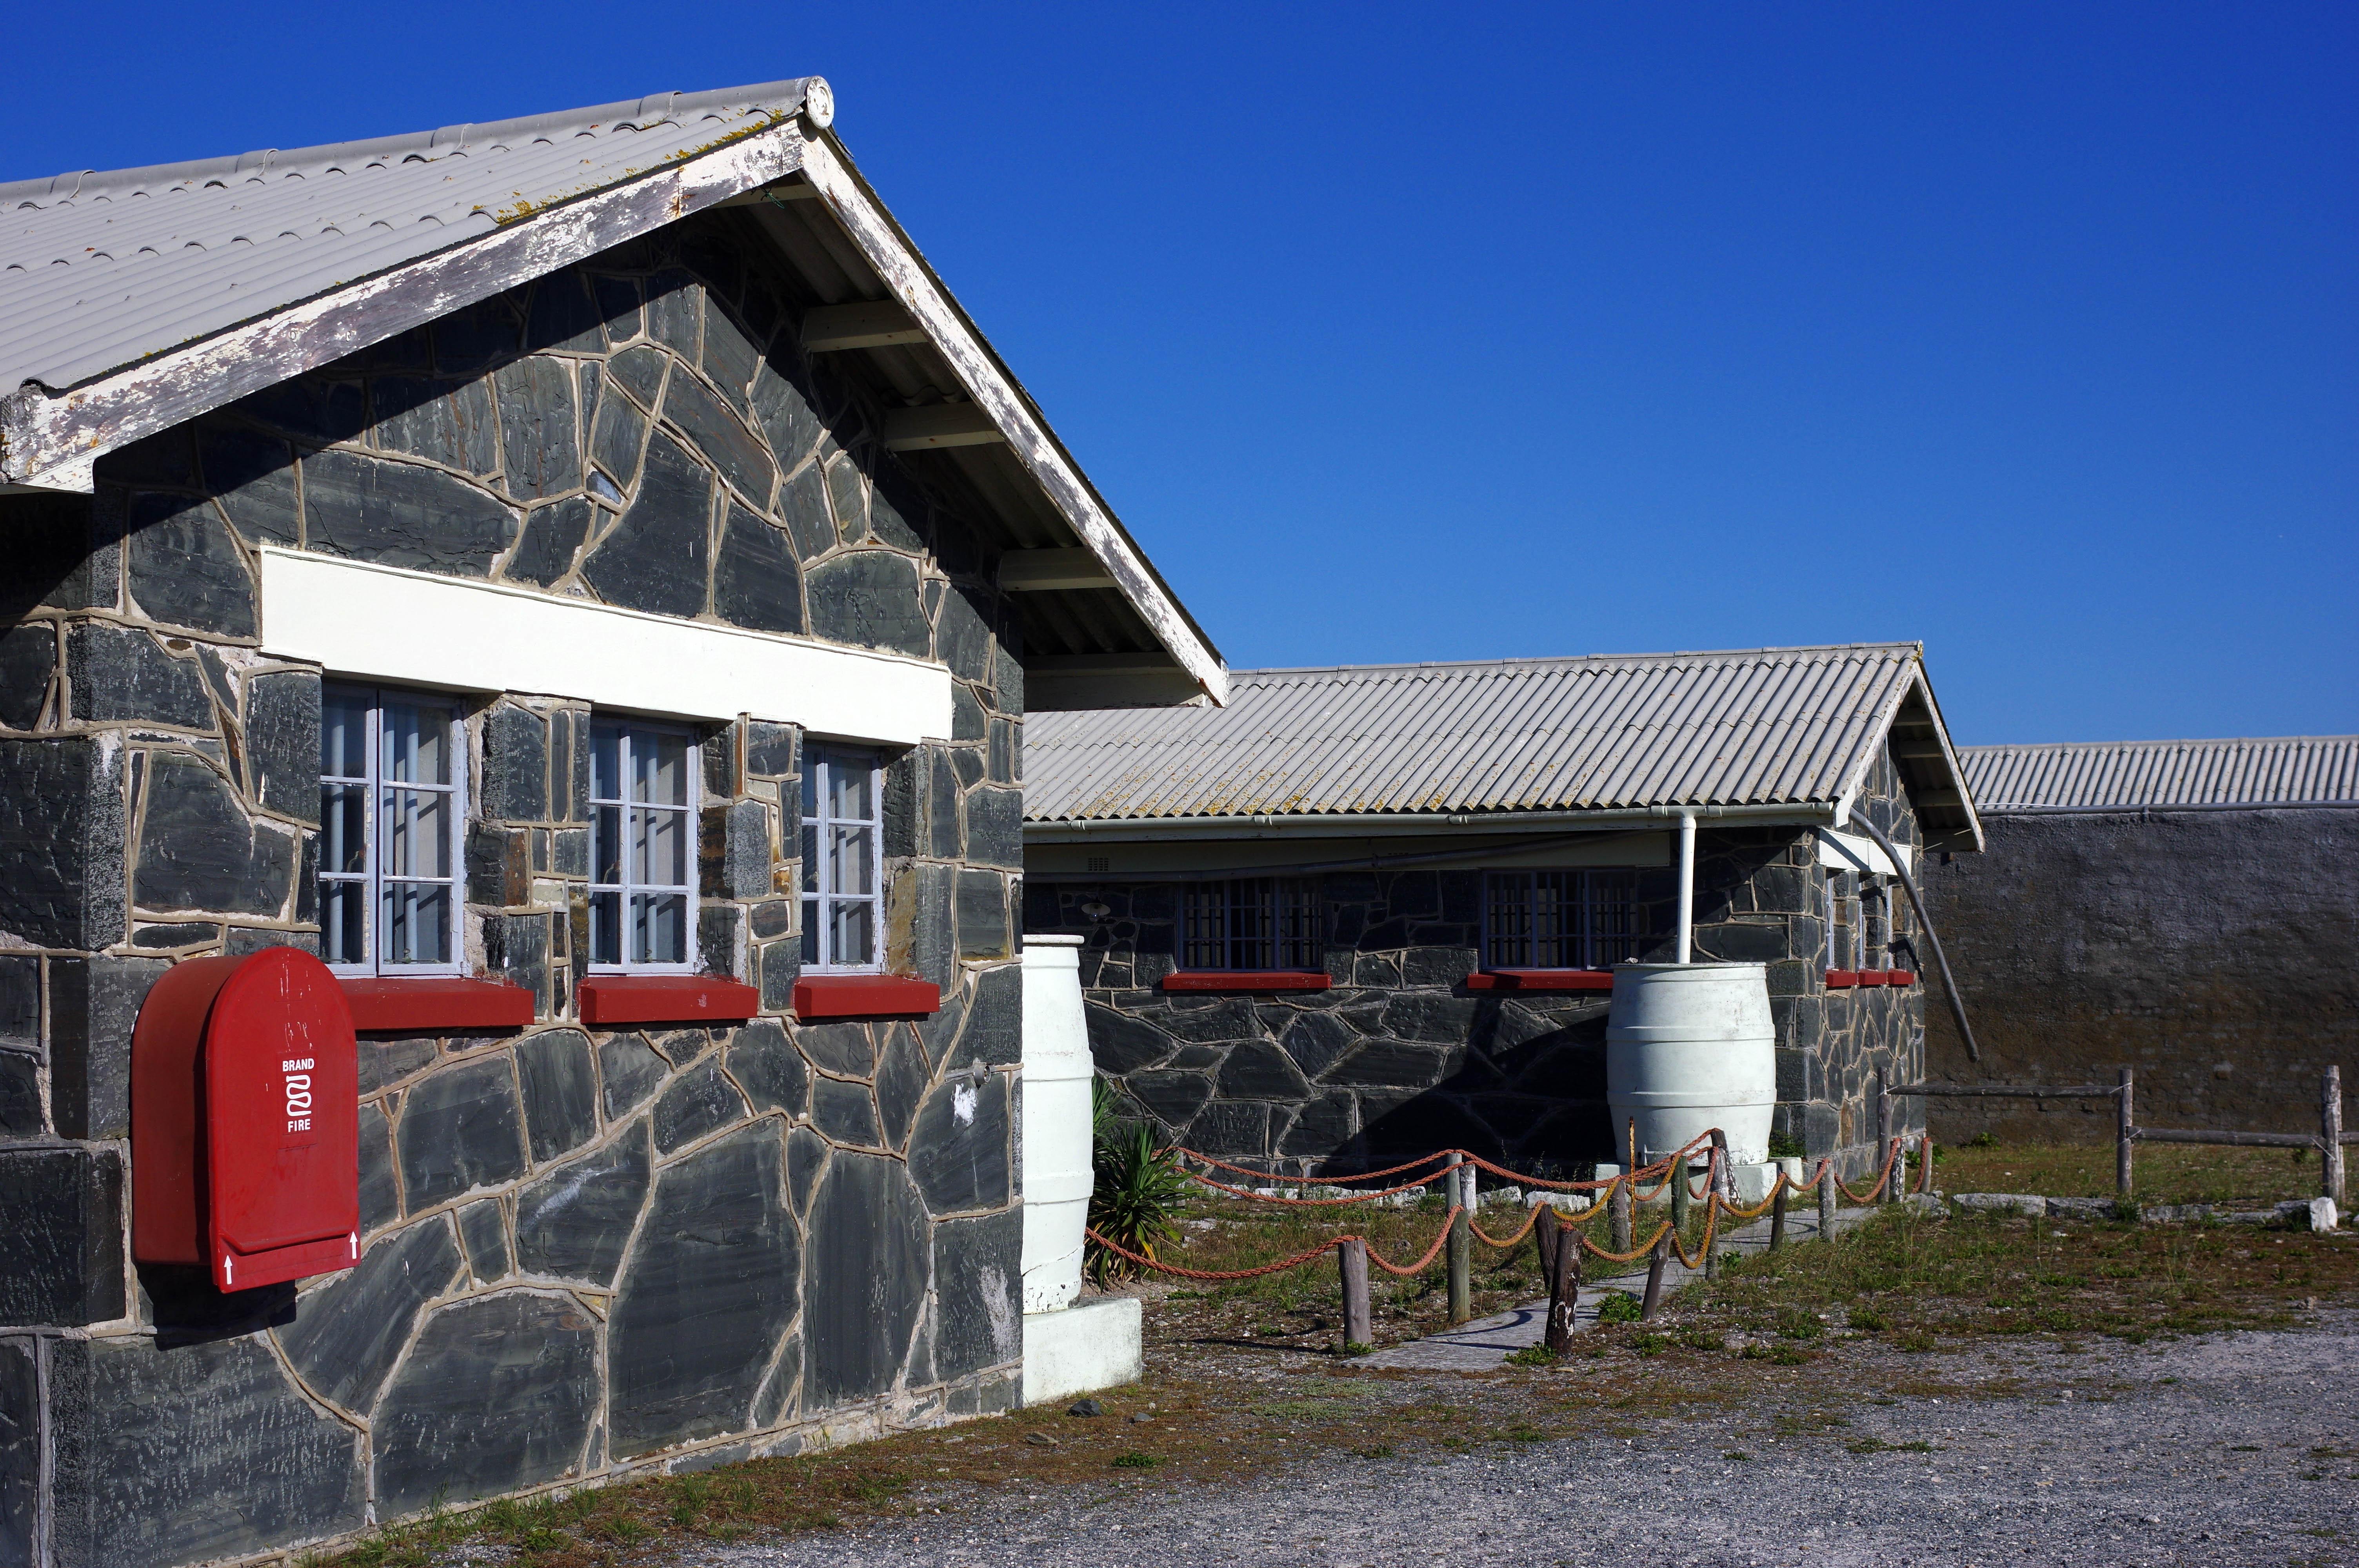 171122_CT_Robben island21